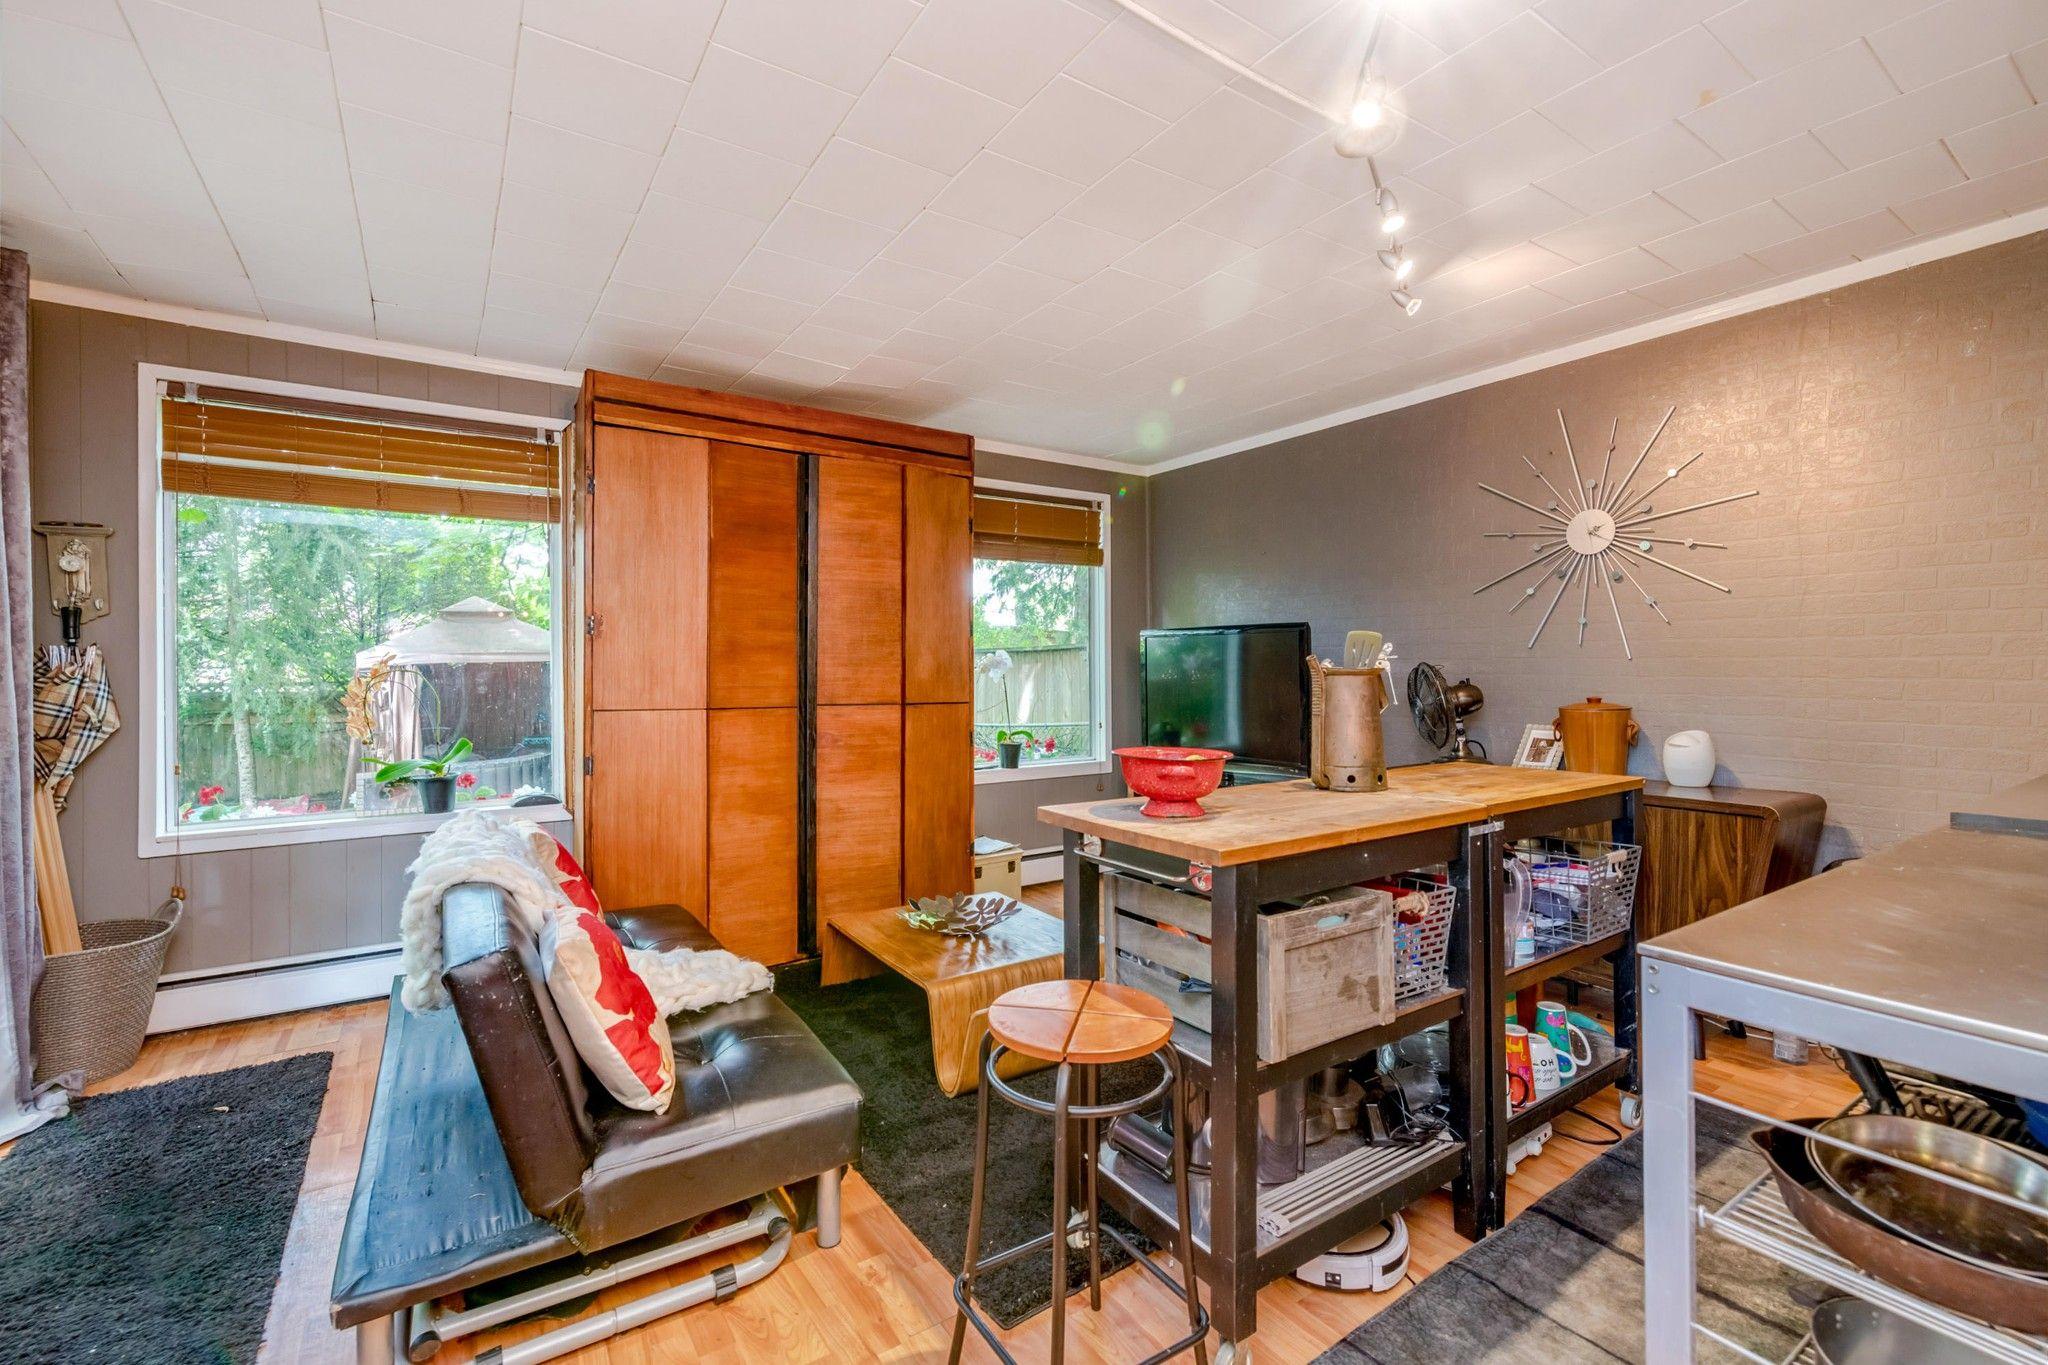 Photo 19: Photos: 20623 114 Avenue in Maple Ridge: Southwest Maple Ridge House for sale : MLS®# R2465656